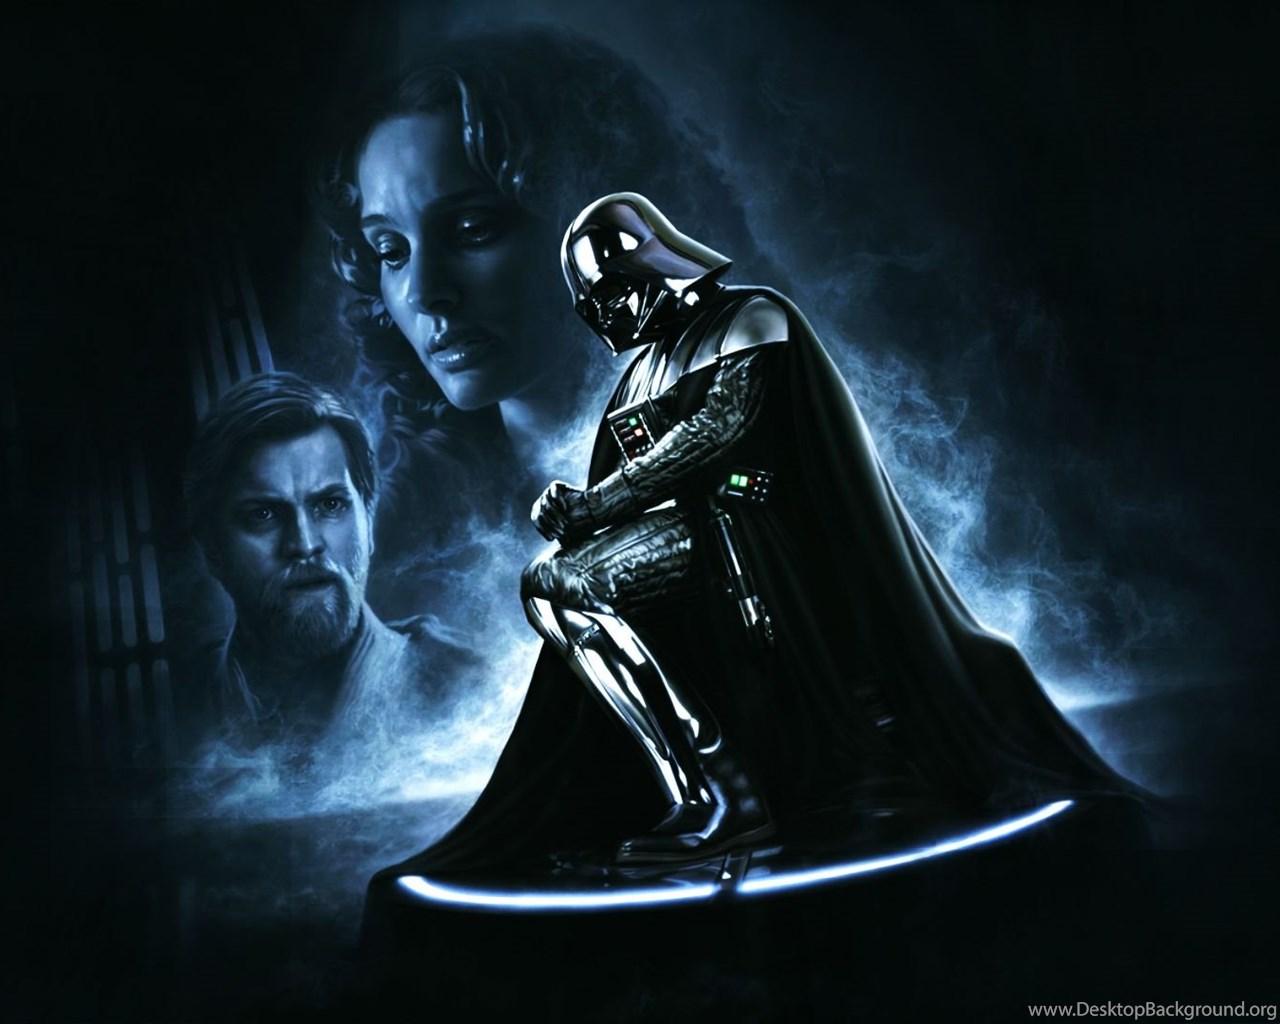 Download Star Wars HD Wallpapers Darth Vader Free